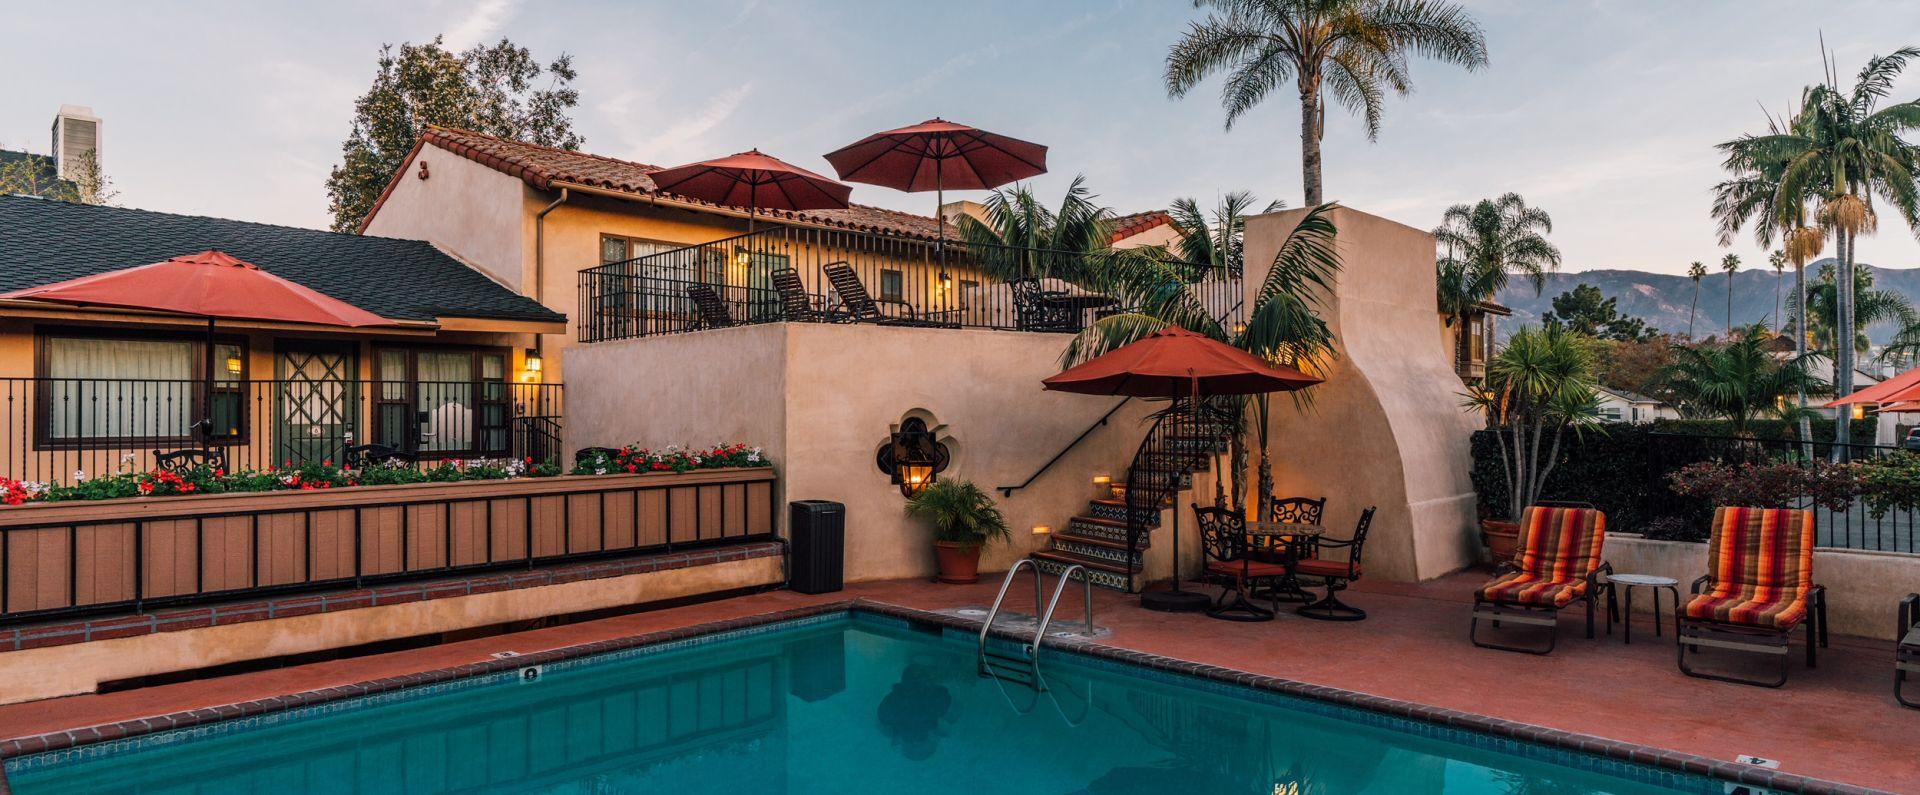 Santa Barbara Hotels >> Santa Barbara Beach Hotel Brisas Del Mar Inn At The Beach